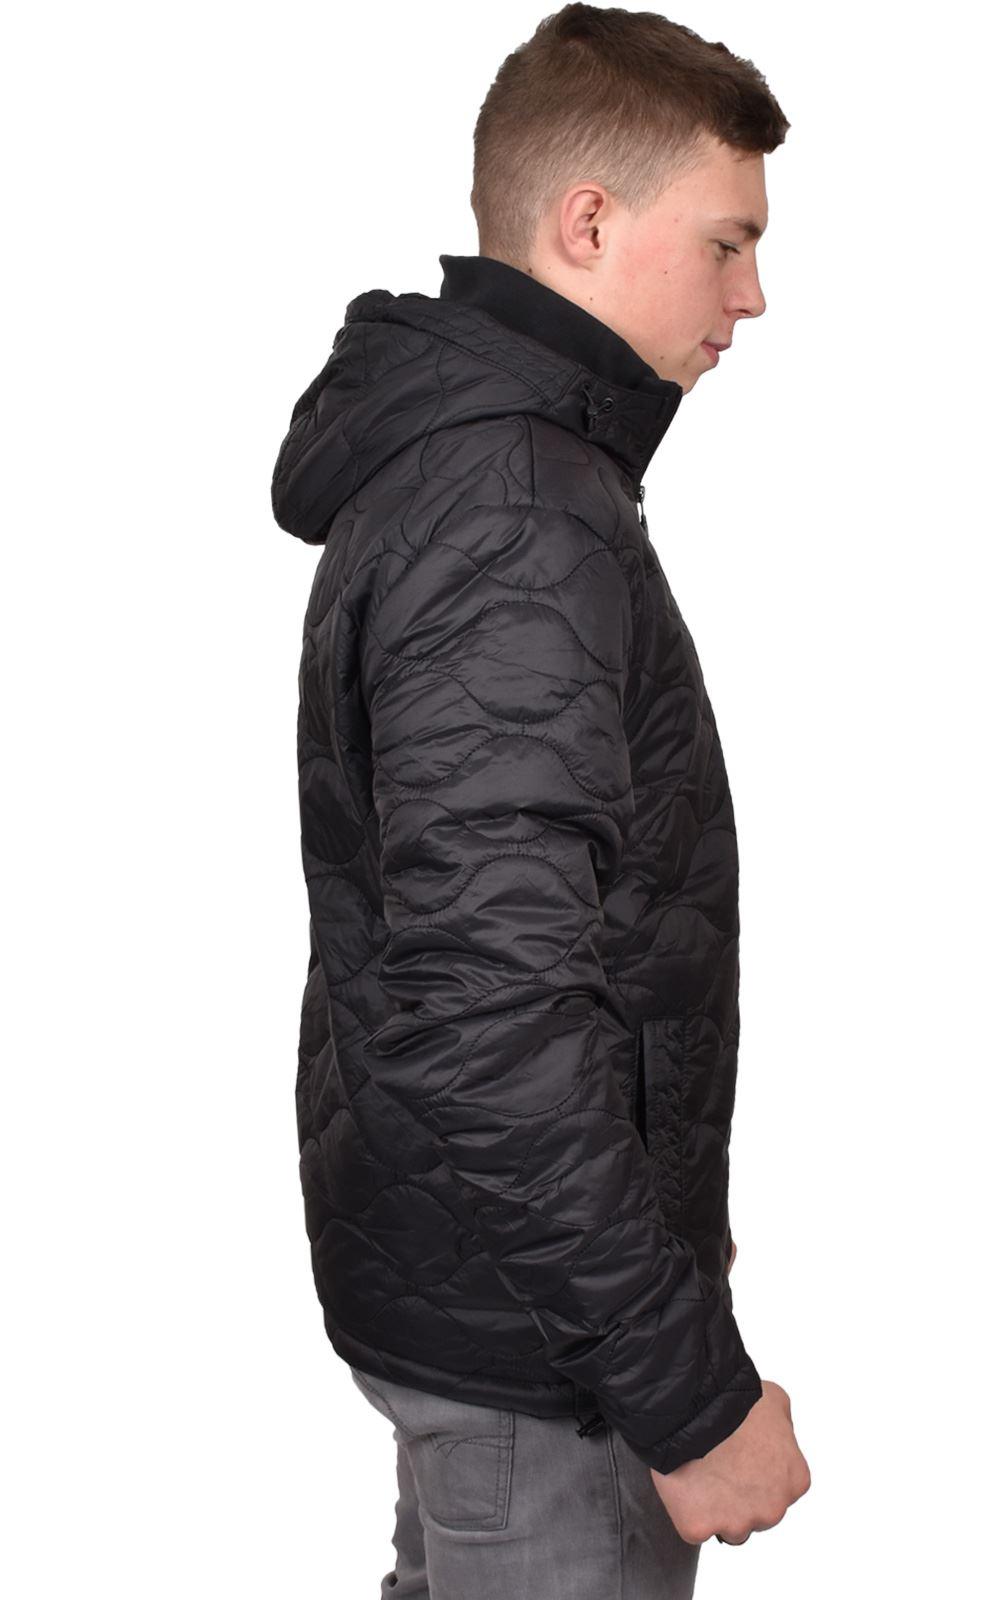 Mens-Smith-amp-Jones-Jacket-Full-Zip-Fleece-Lined-Hooded-Light-Weight-Warm-Coat thumbnail 5